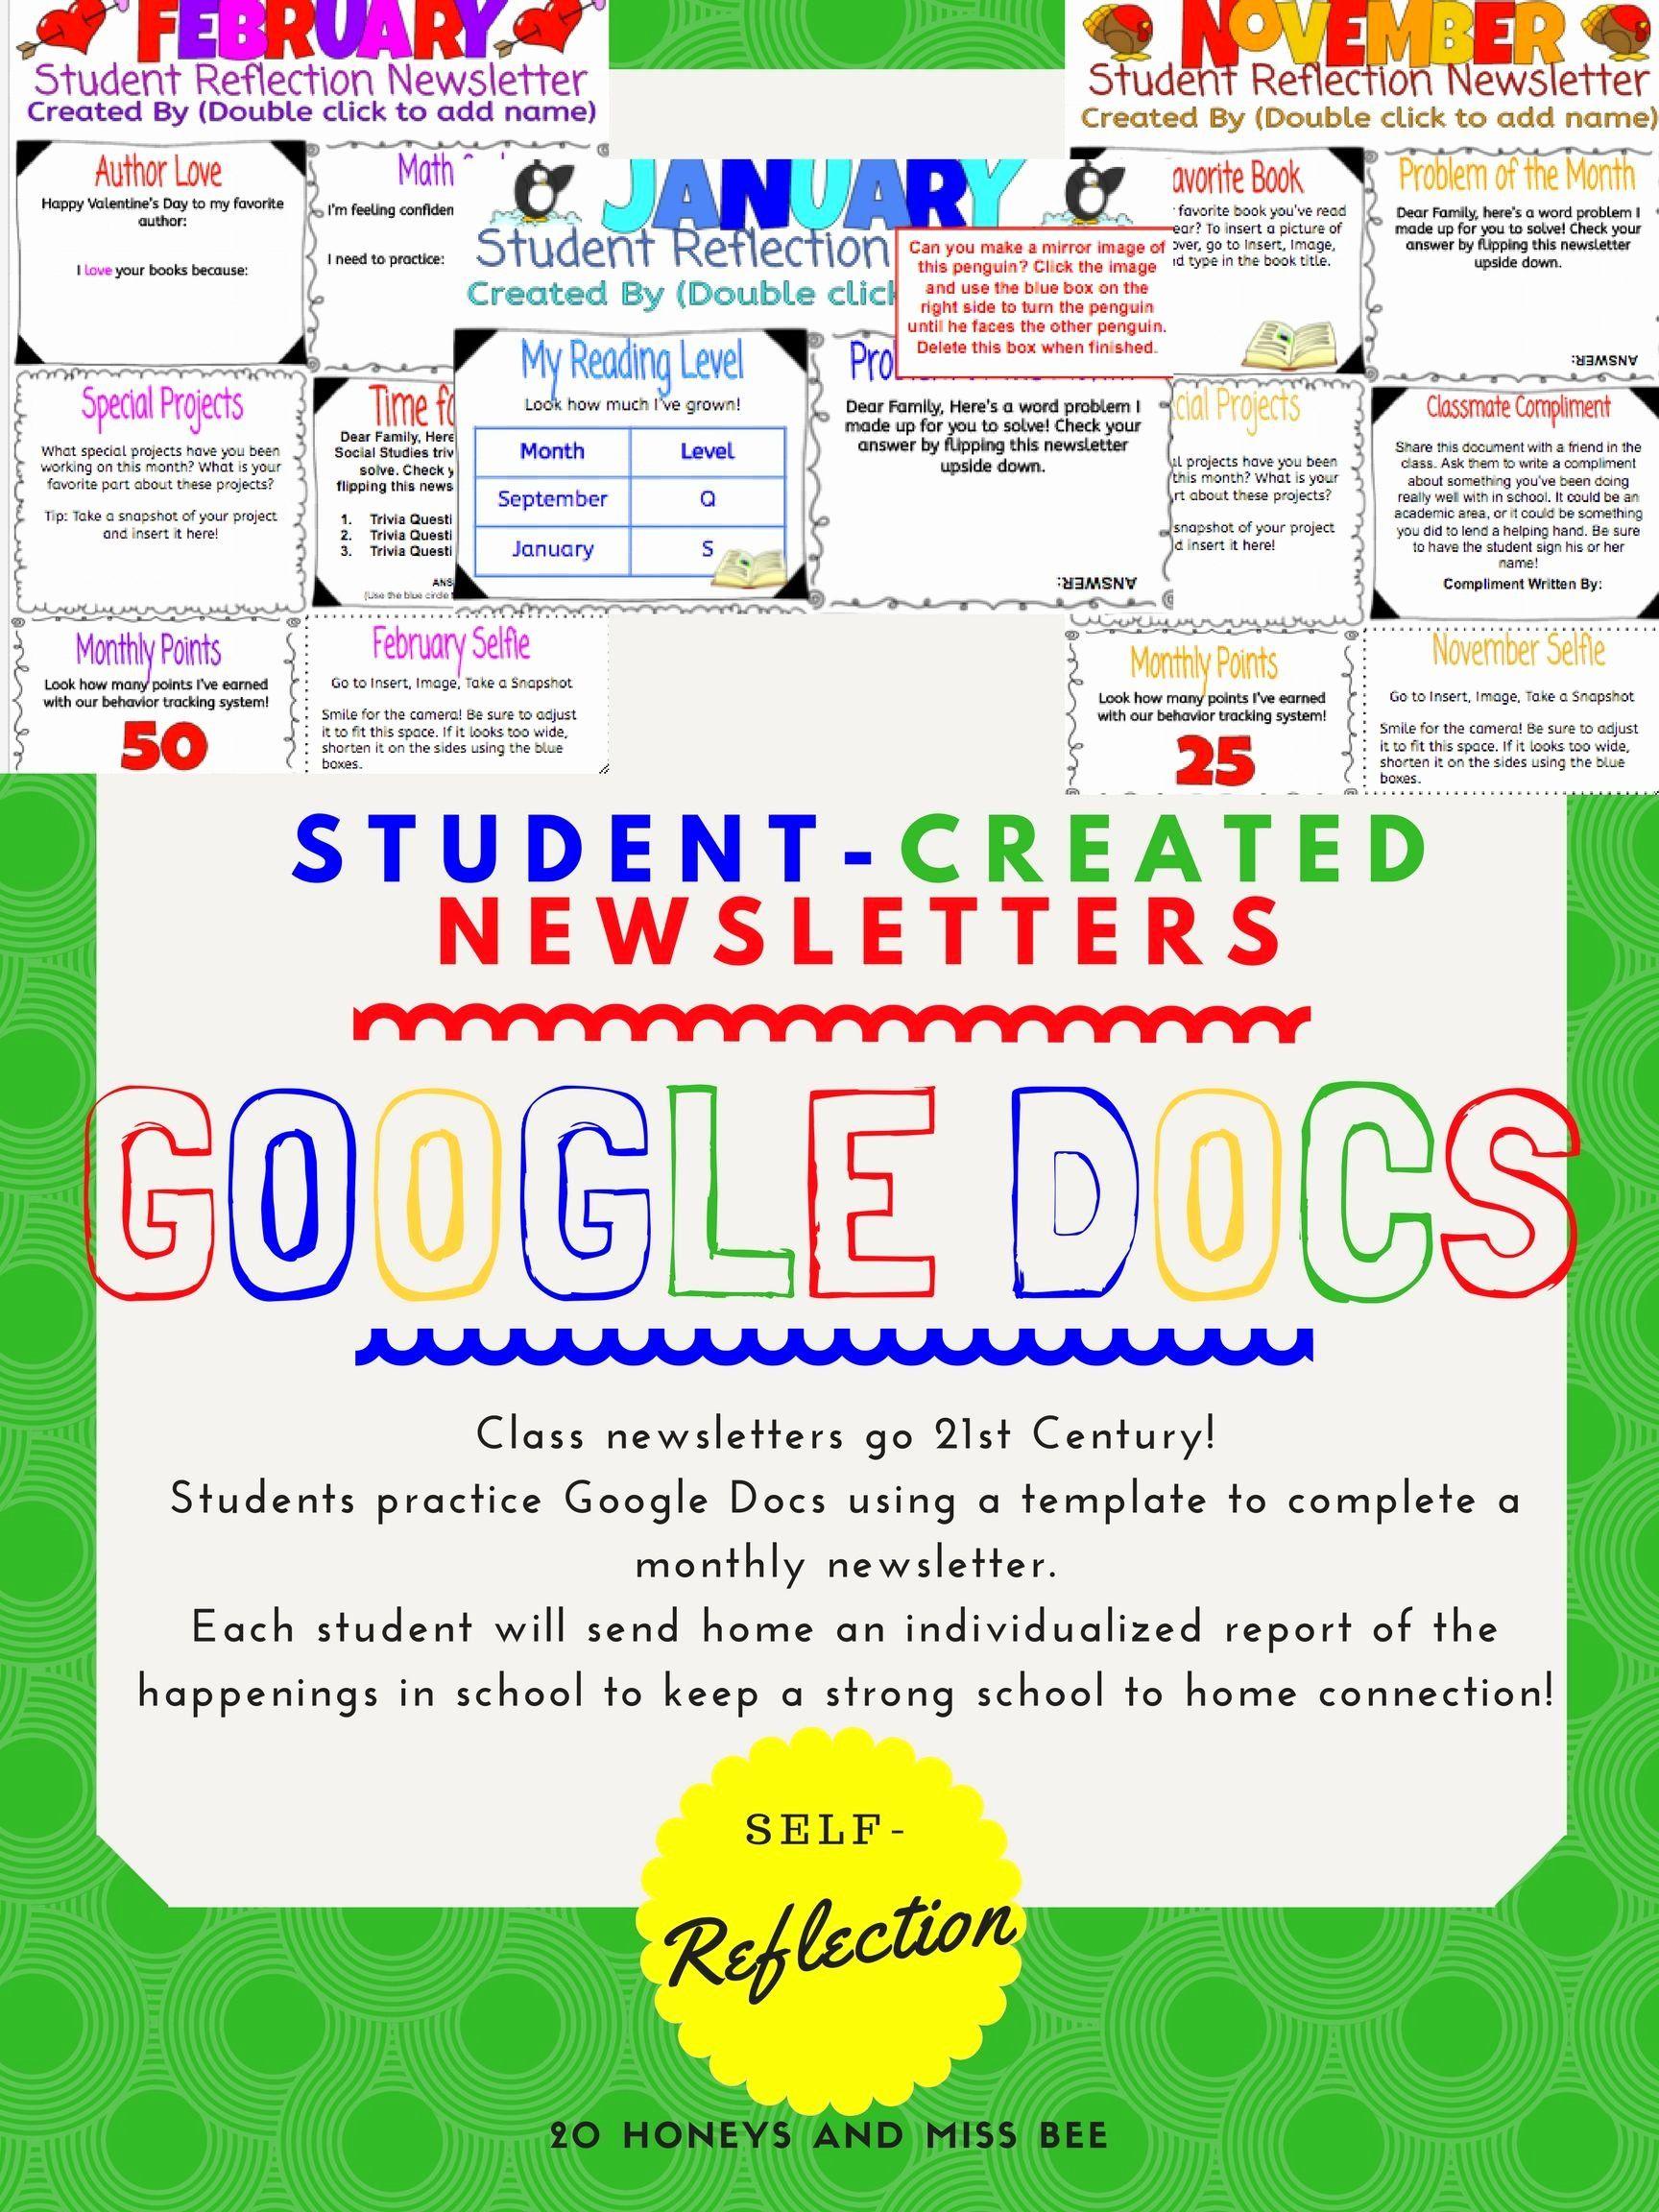 Google Docs Newsletter Template Http Www Valery Novoselsky Org Google Docs Newsletter Te Newsletter Templates Newsletter Template Free How To Make Brochure